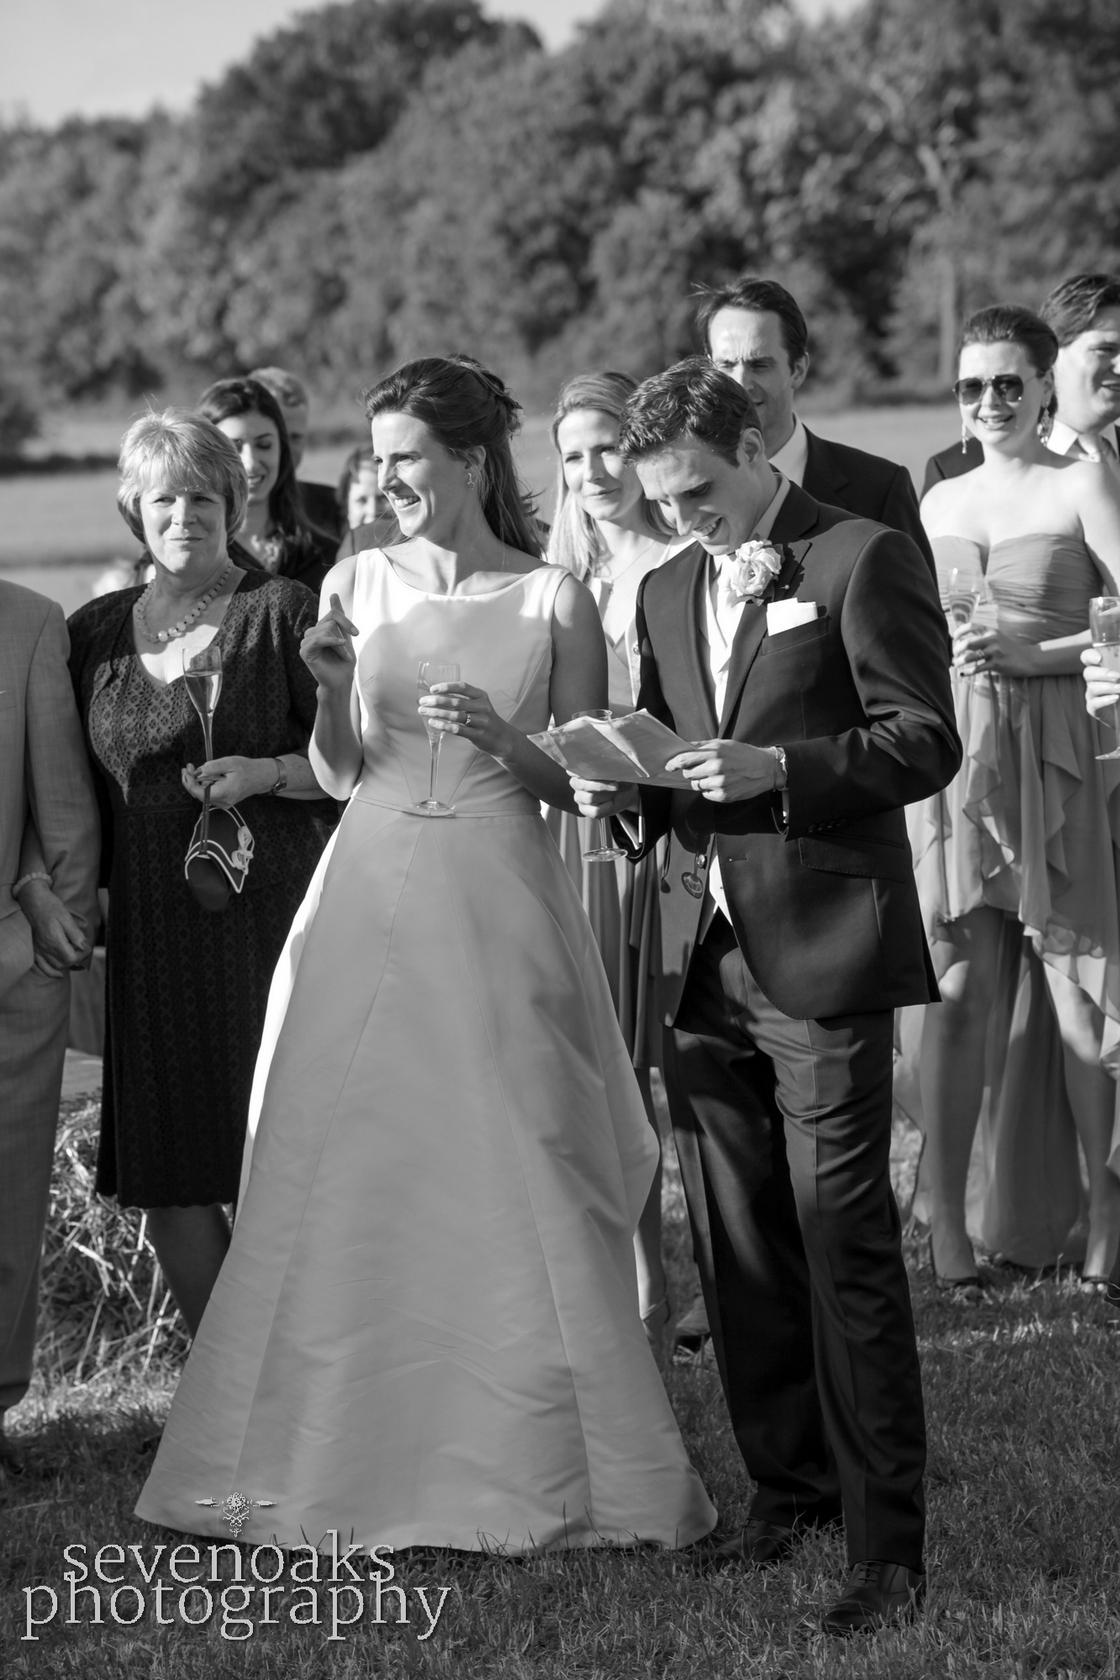 Sevenoaks documentary wedding photographer-121.jpg